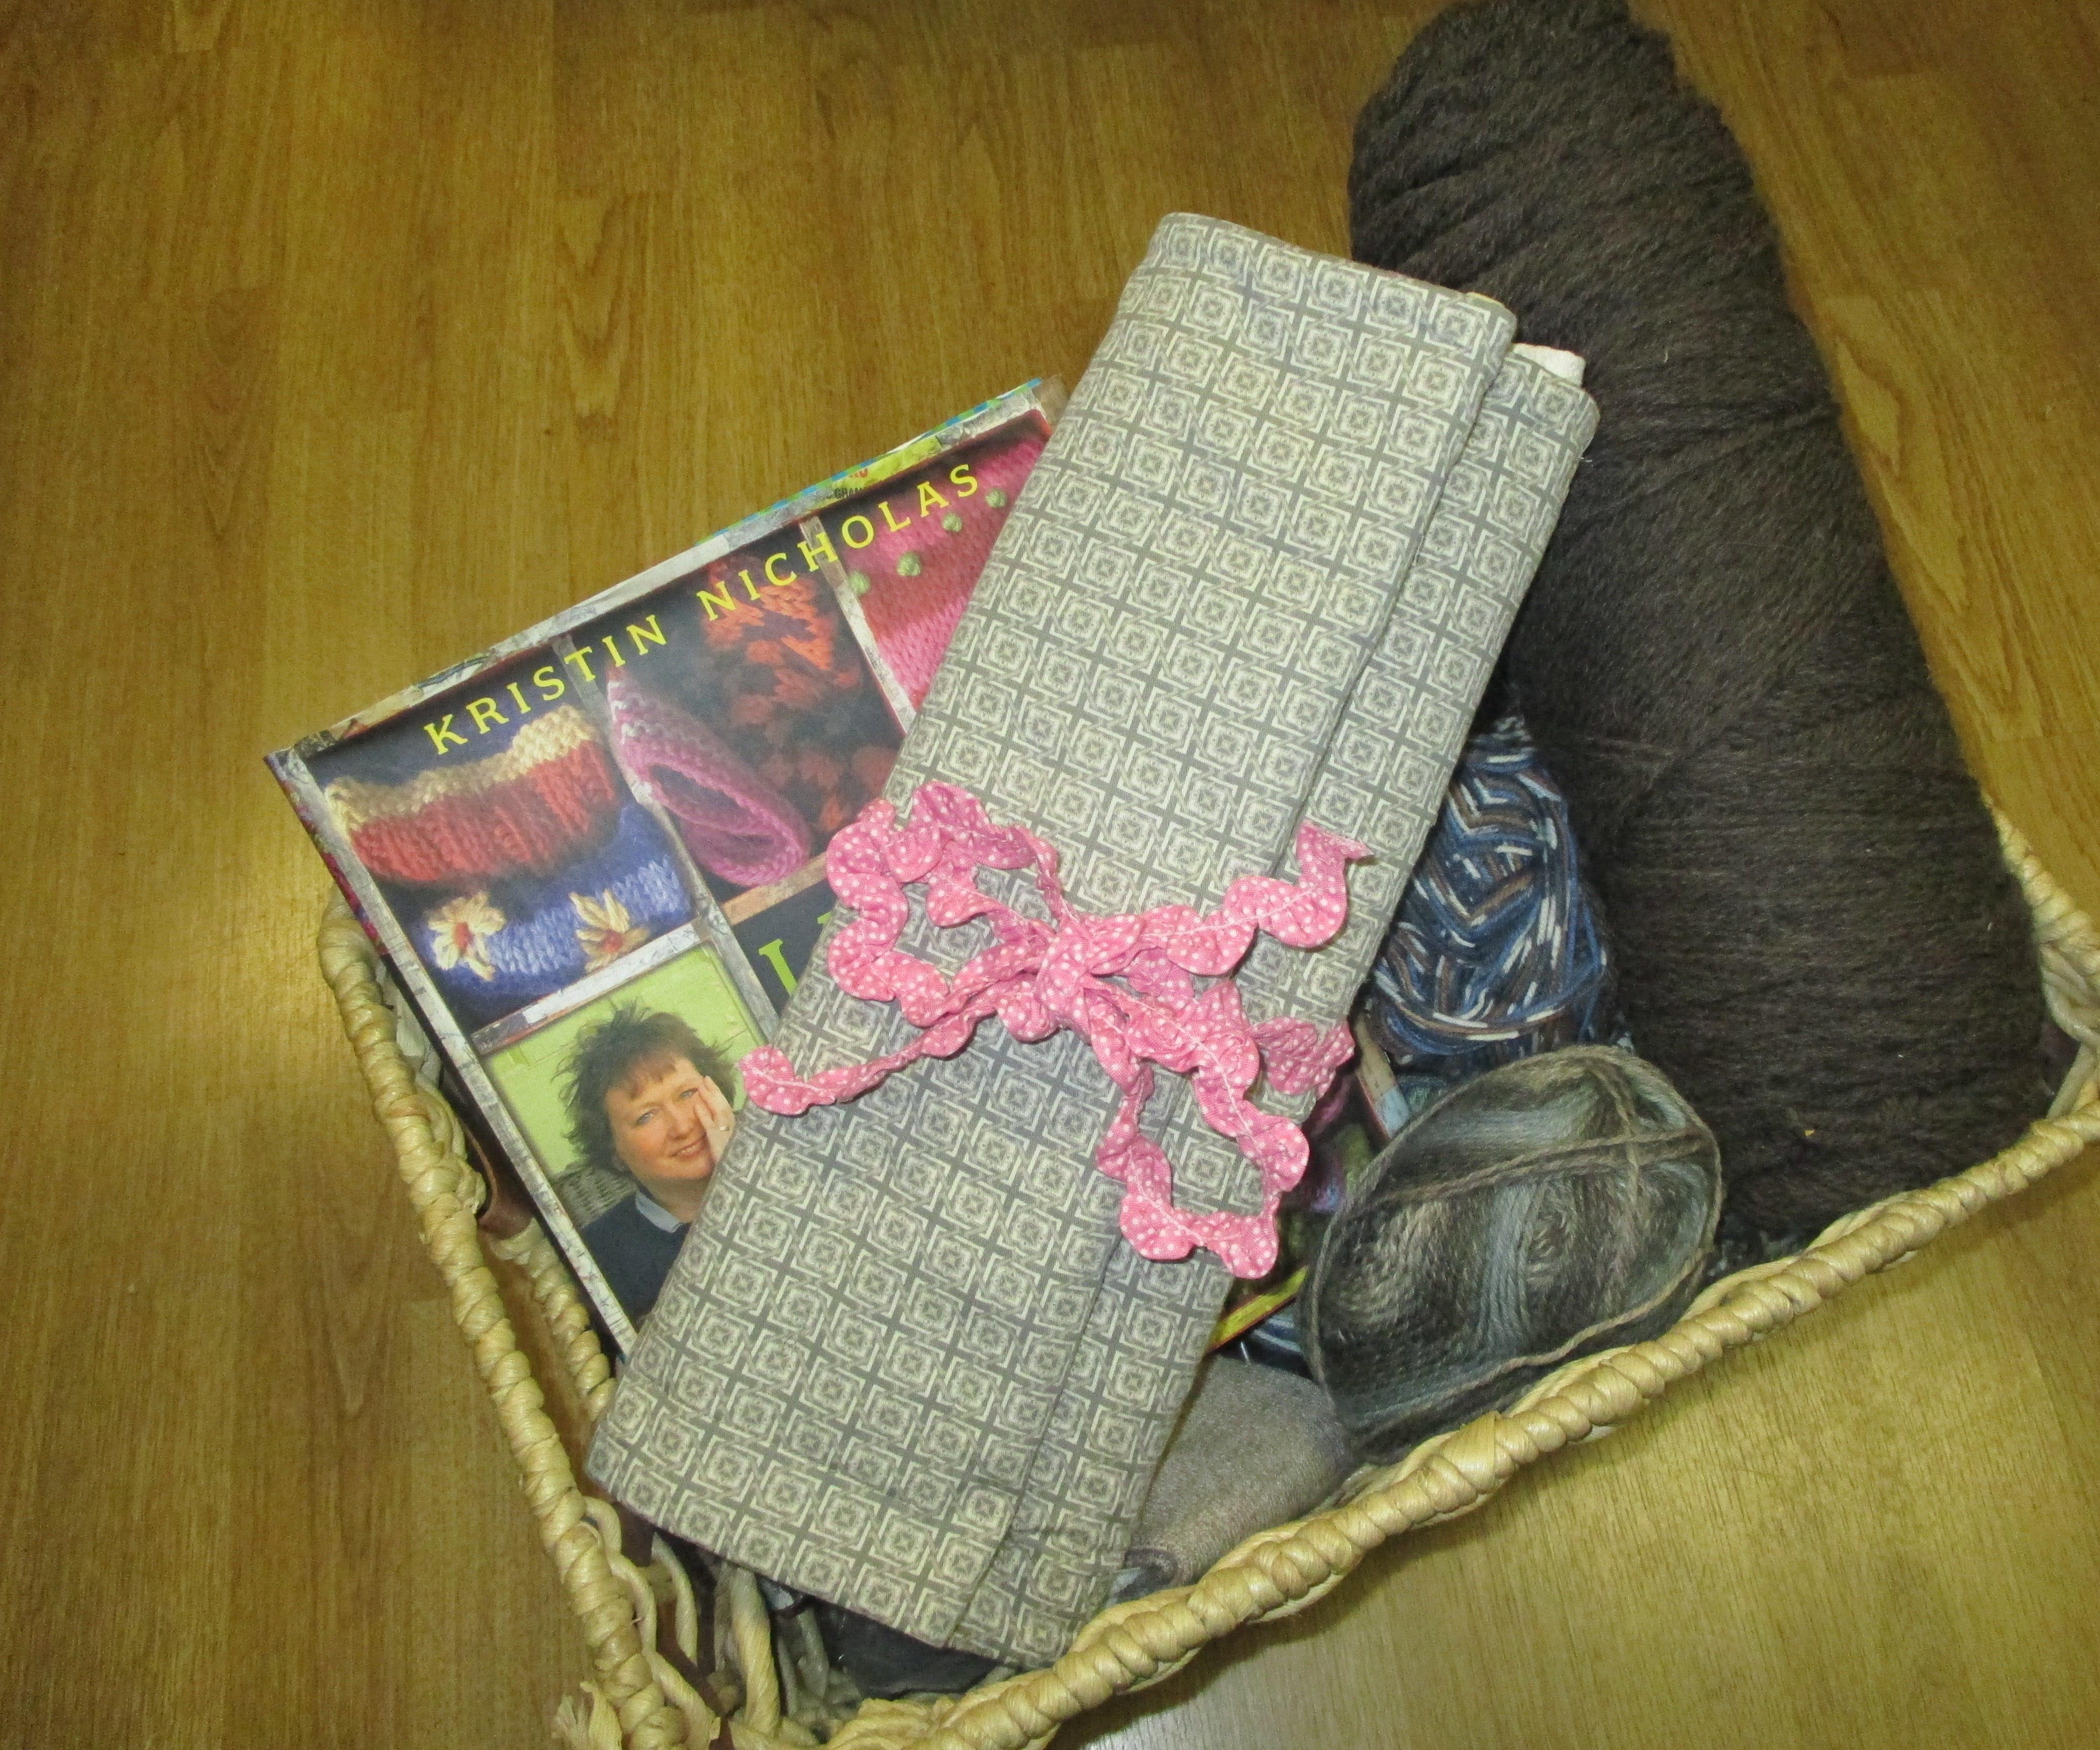 It's Knitting Season! Needle/Hook Organizer